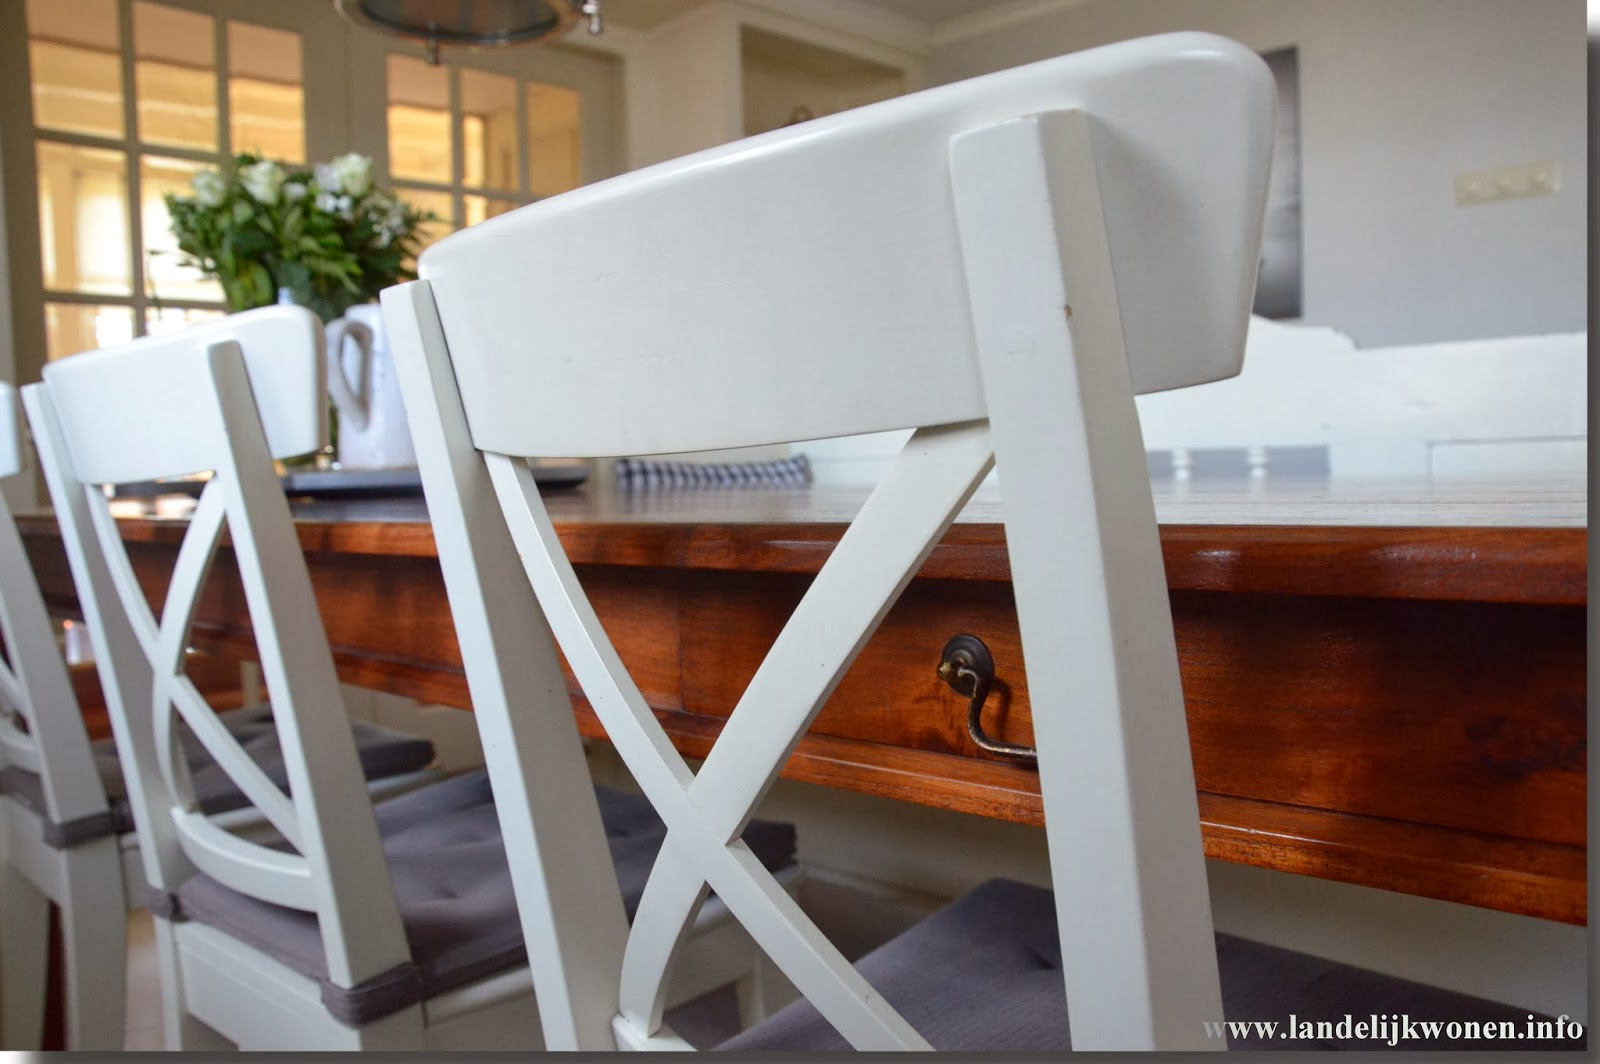 Goedkope Eettafel Bank  Tafel bankje leenbakker  kleine houten bankjes meubels stoelen  Bank op